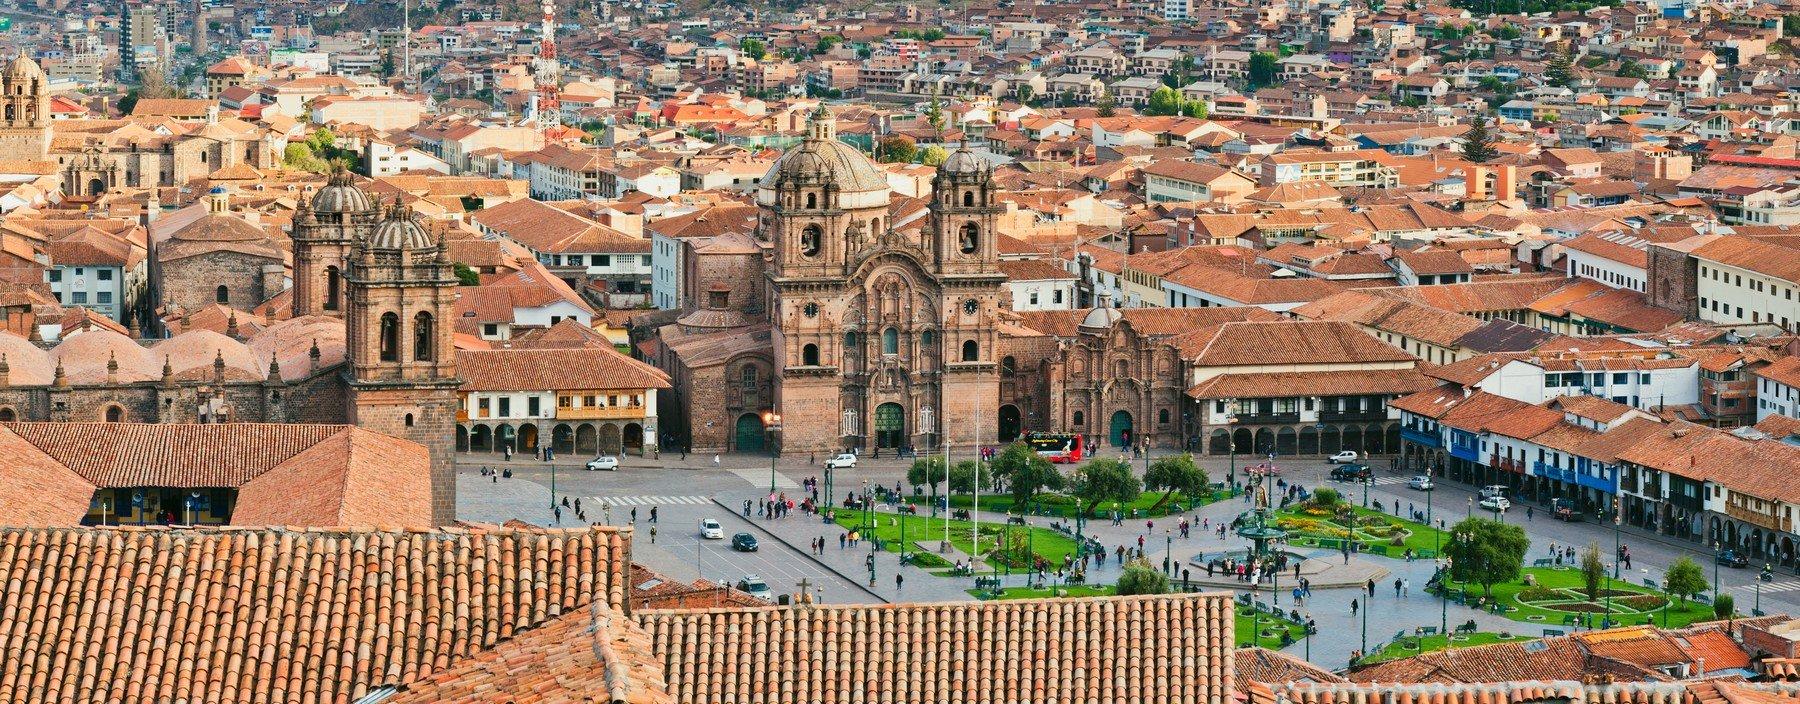 pe, cuzco, plaza de armas (7).jpg